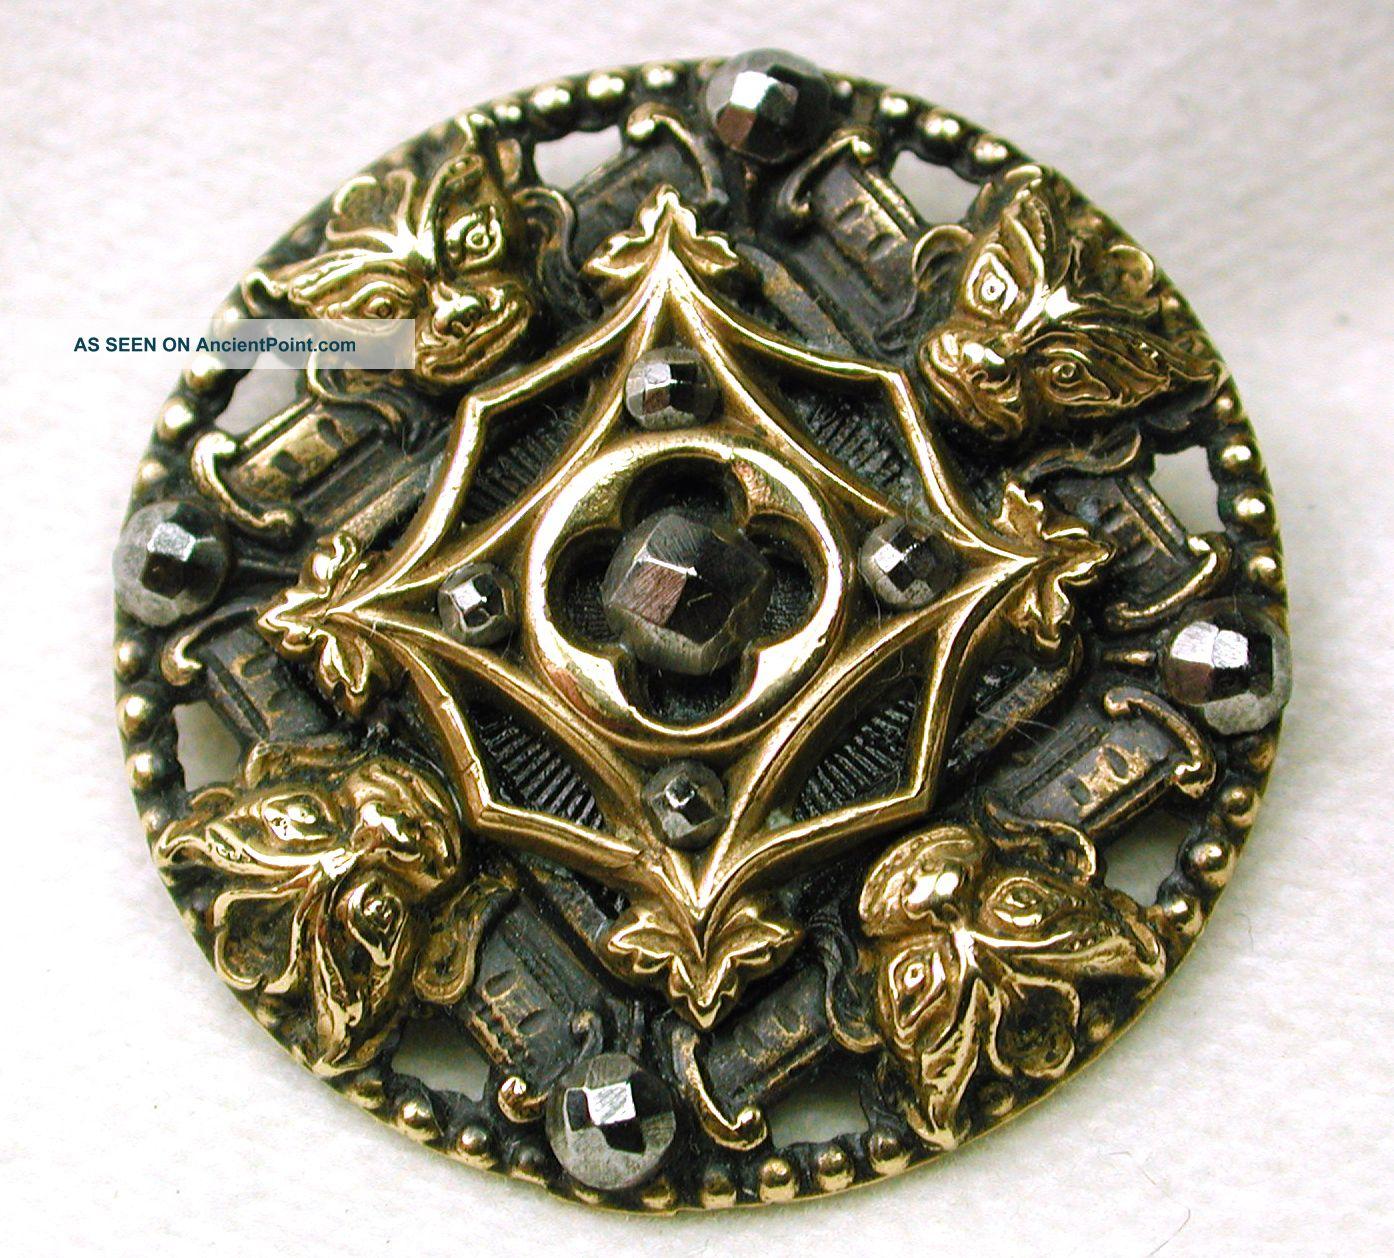 Antique Pierced Brass Button 4 Gargoyles Design With Cut Steel Accents Buttons photo